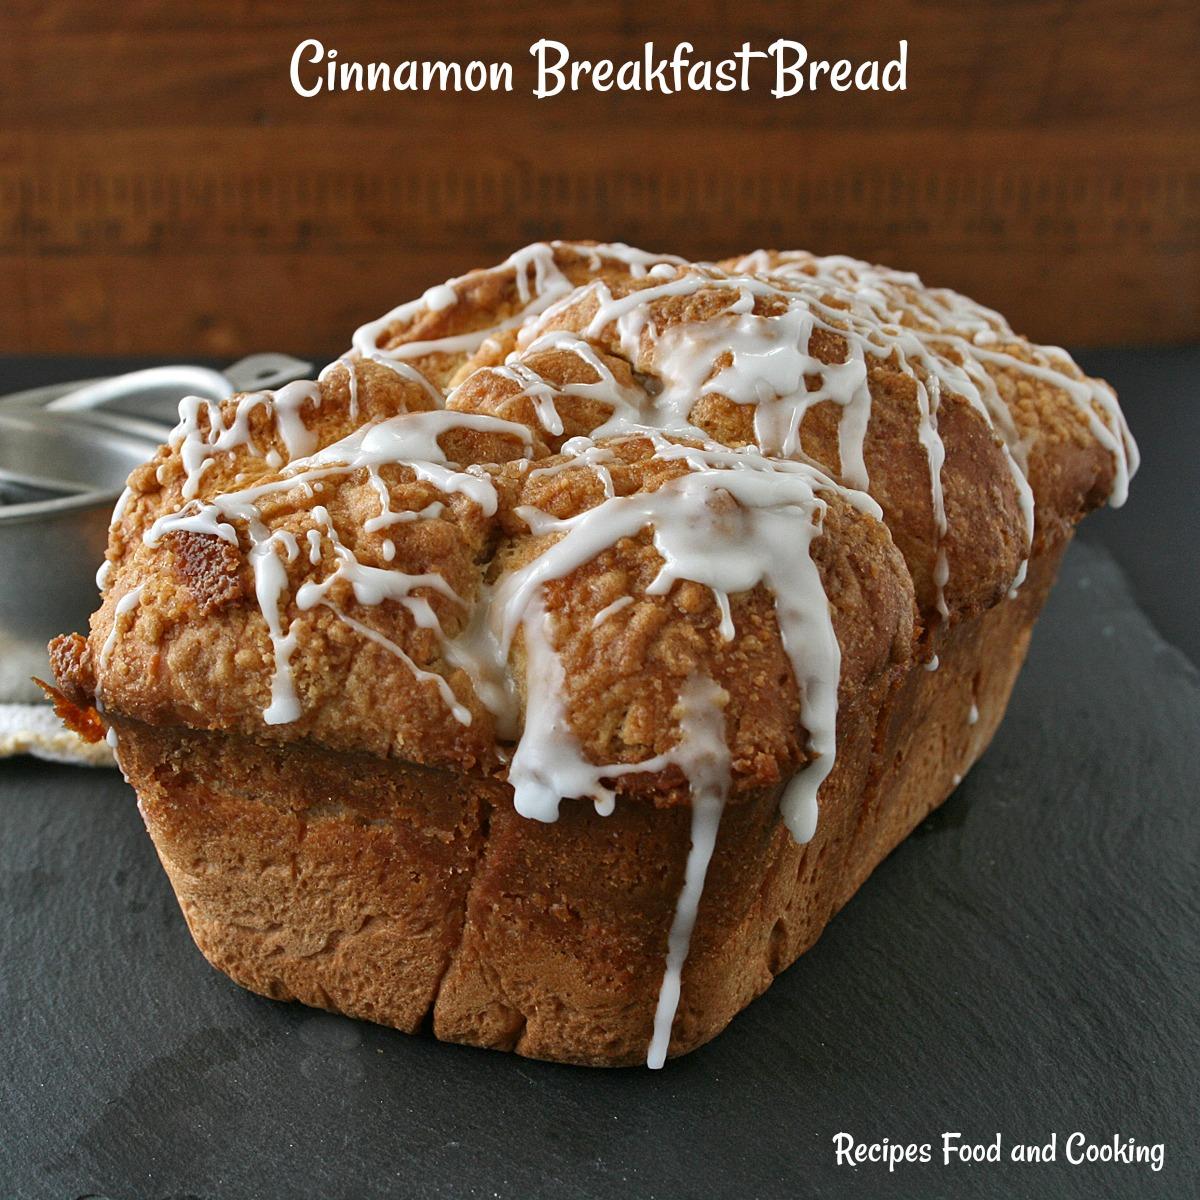 Cinnamon Breakfast Bread